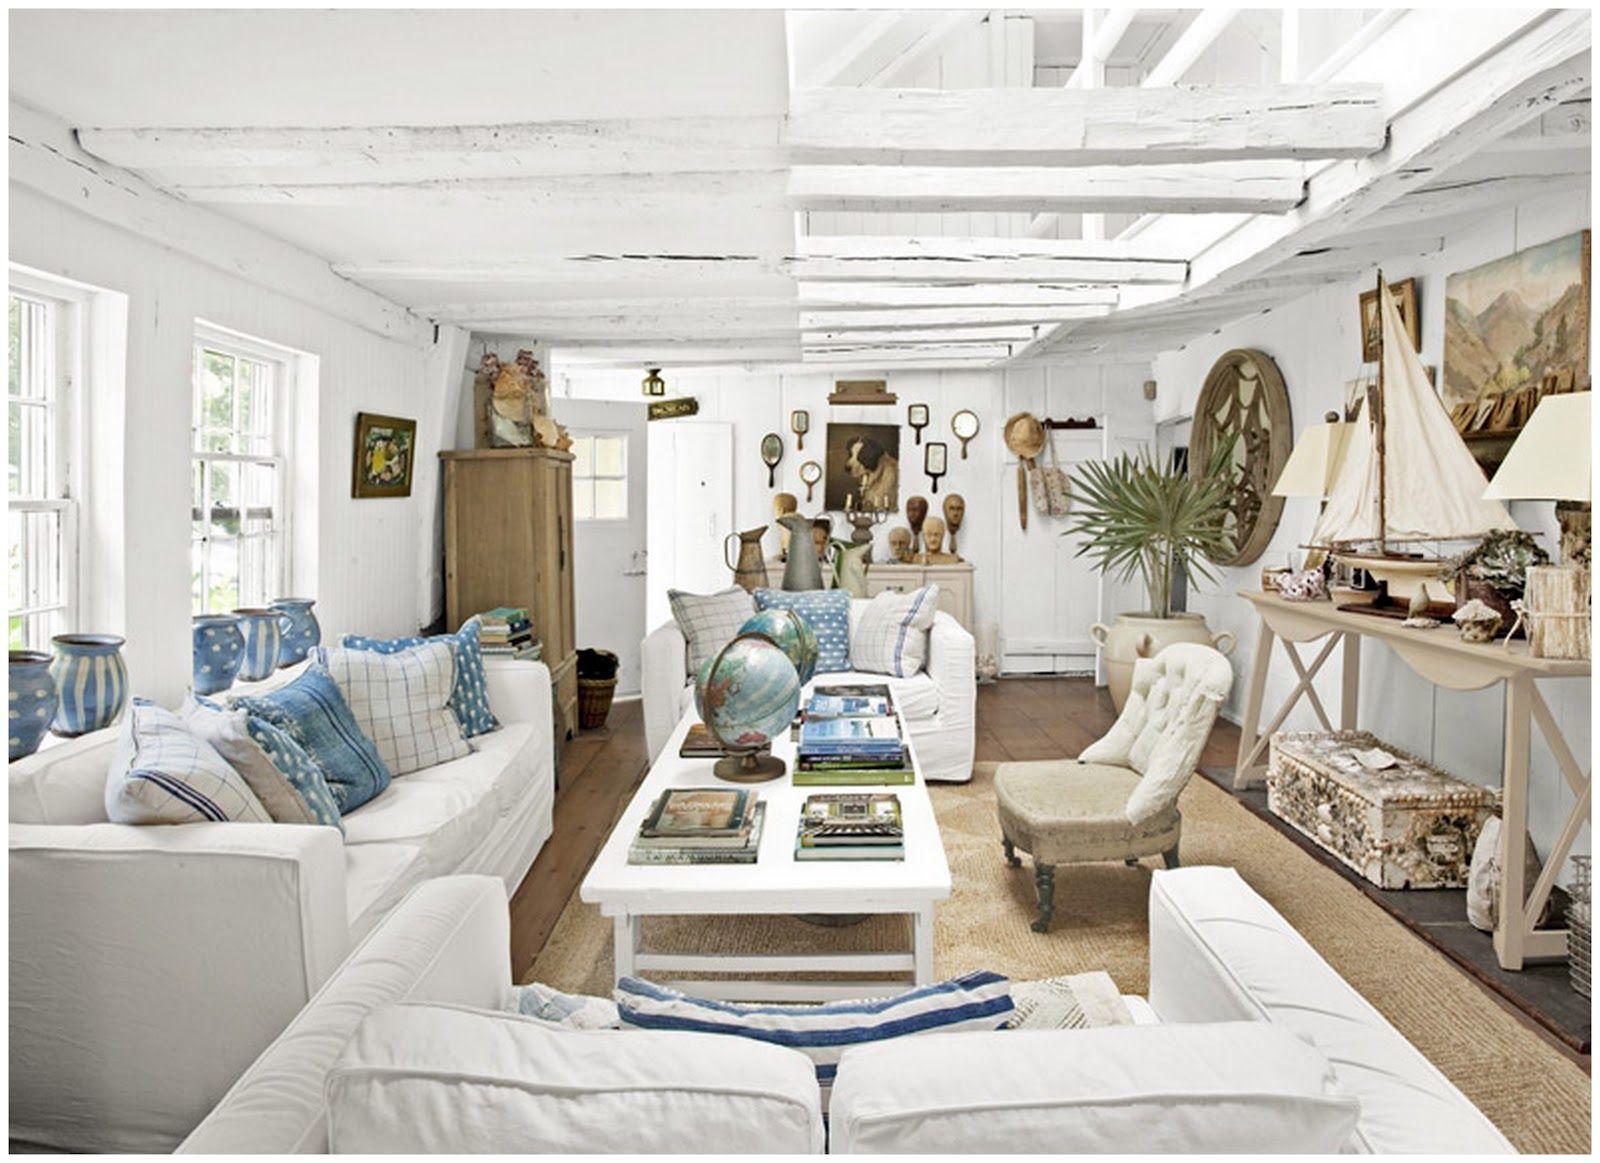 french provincial interior design - Google Search | L i V i N G ...